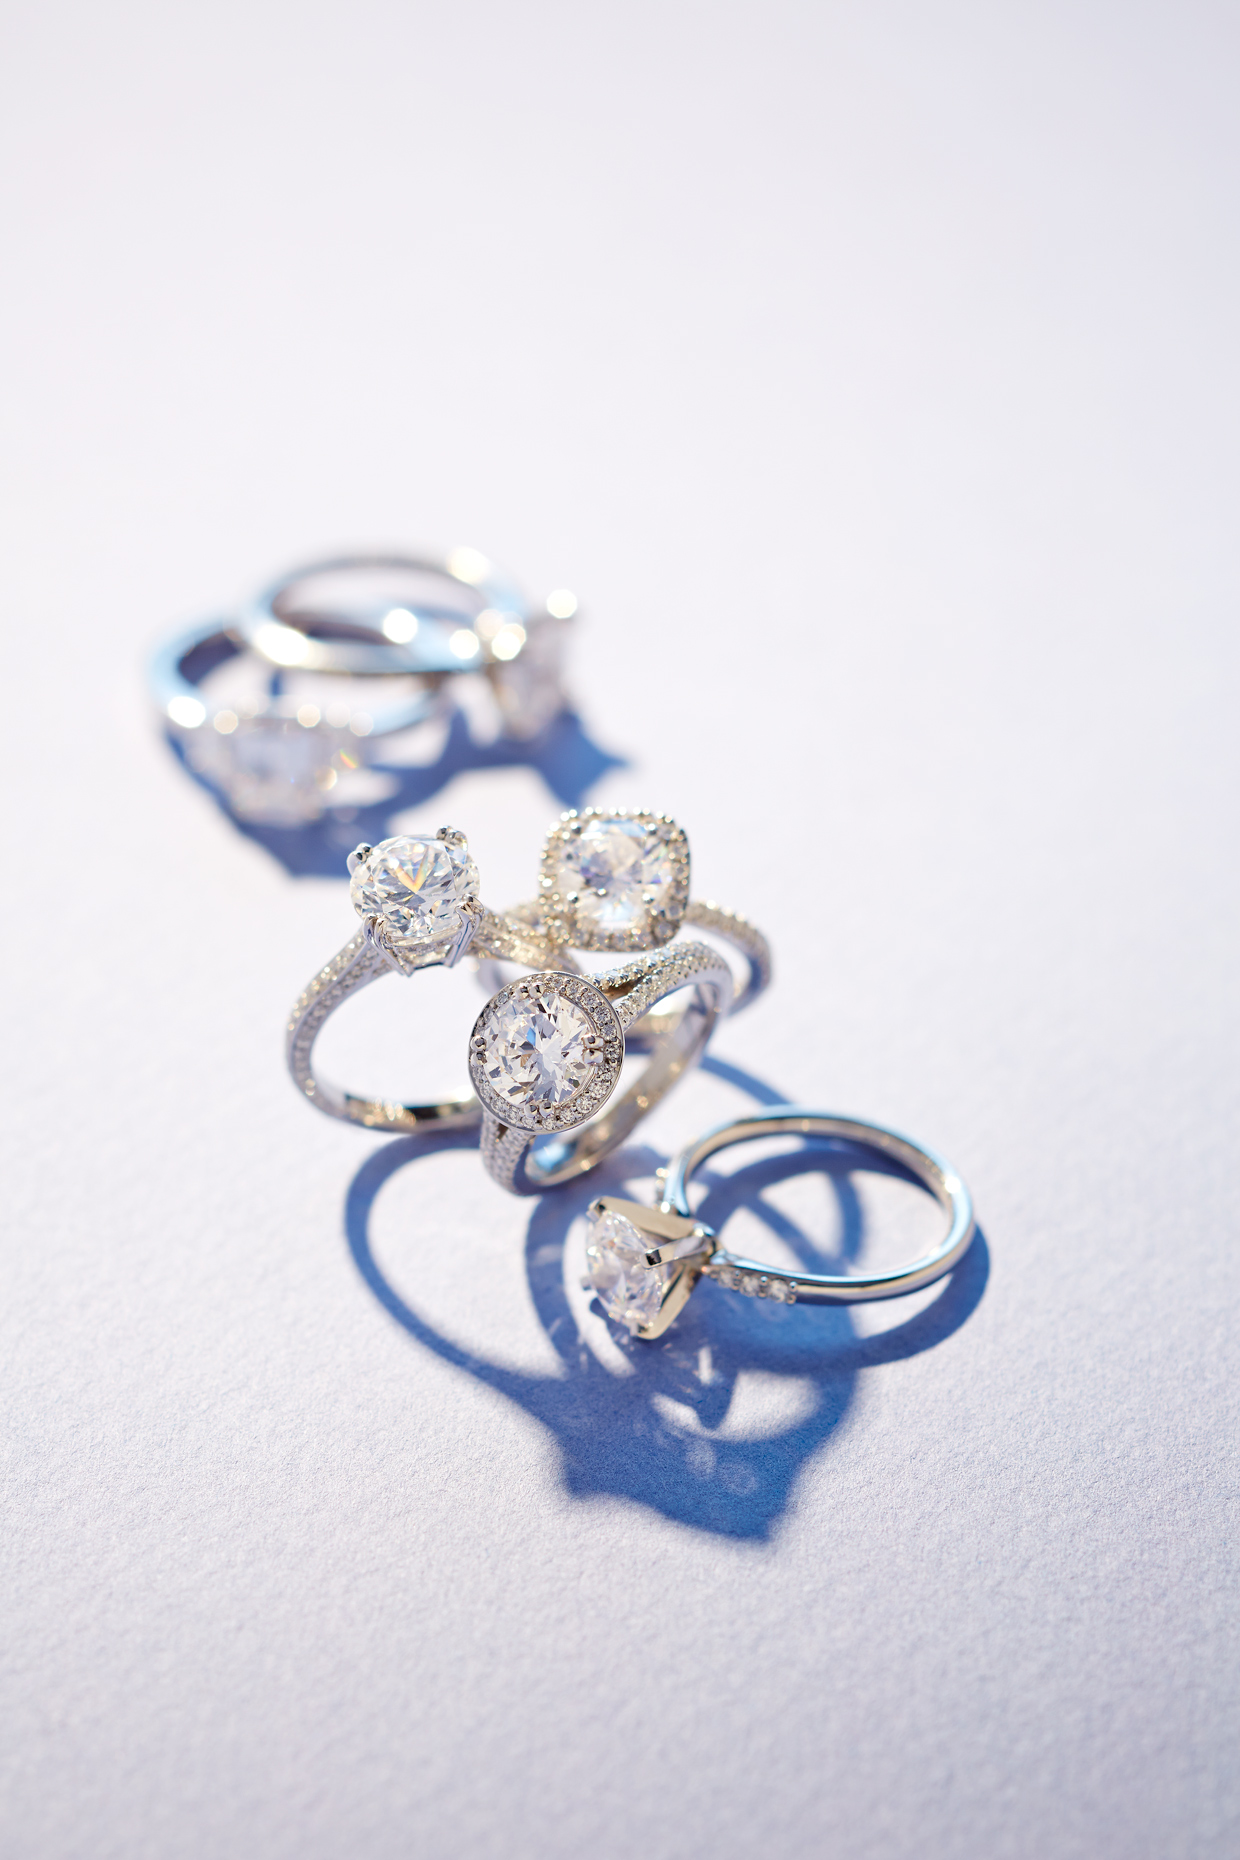 Product photography Jewelry Derek Israelsen Round Diamond Rings